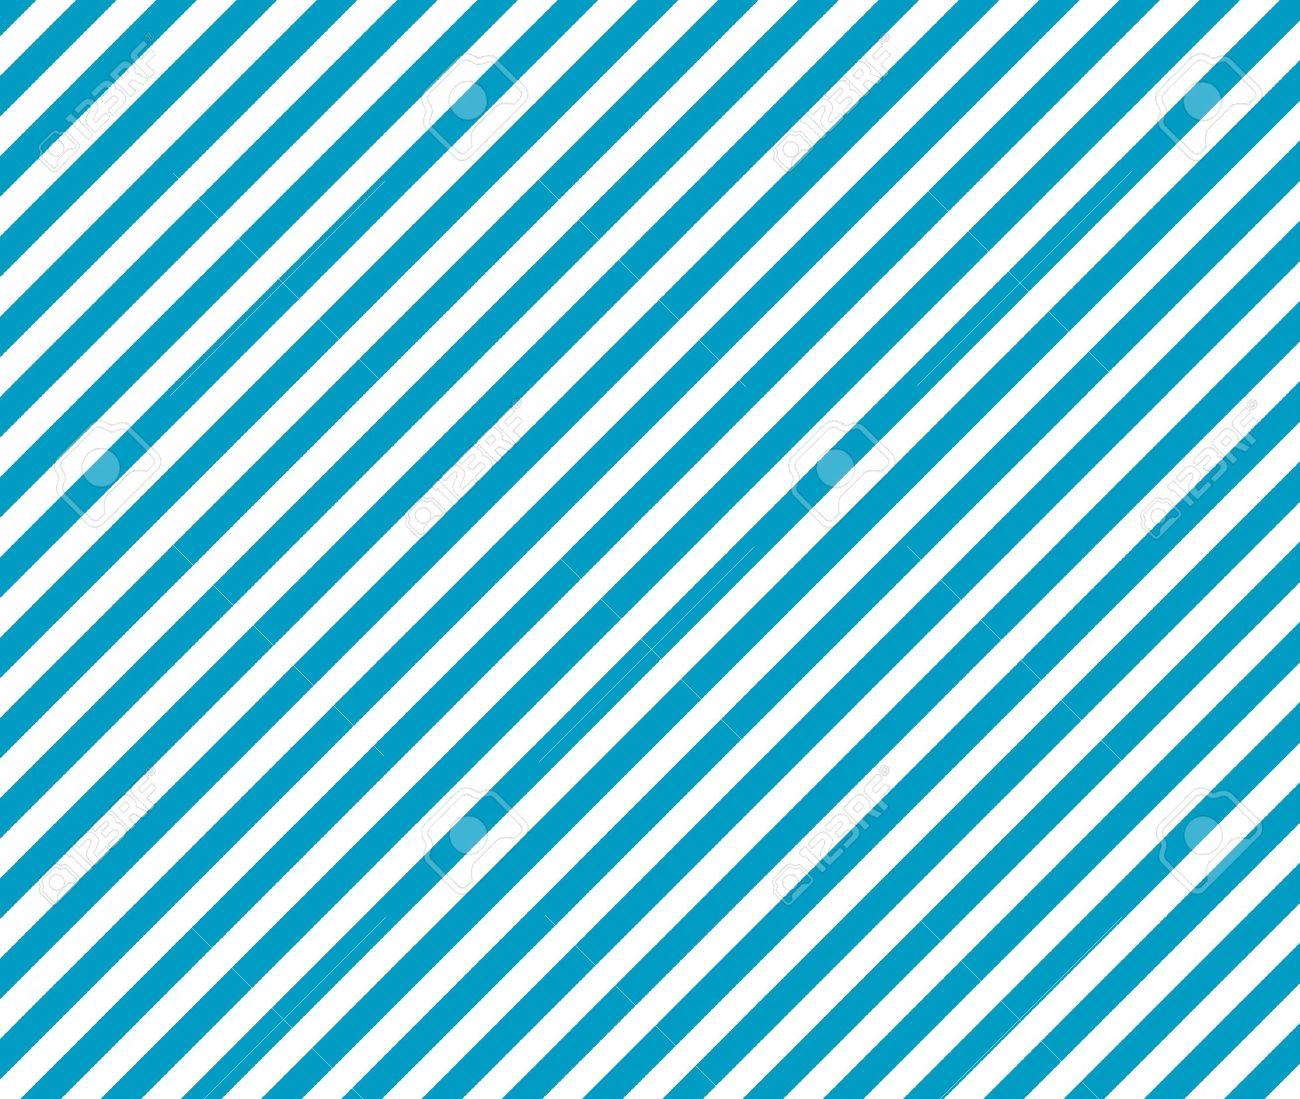 Light Blue Background And White Diagonal Stripes Stock Photo